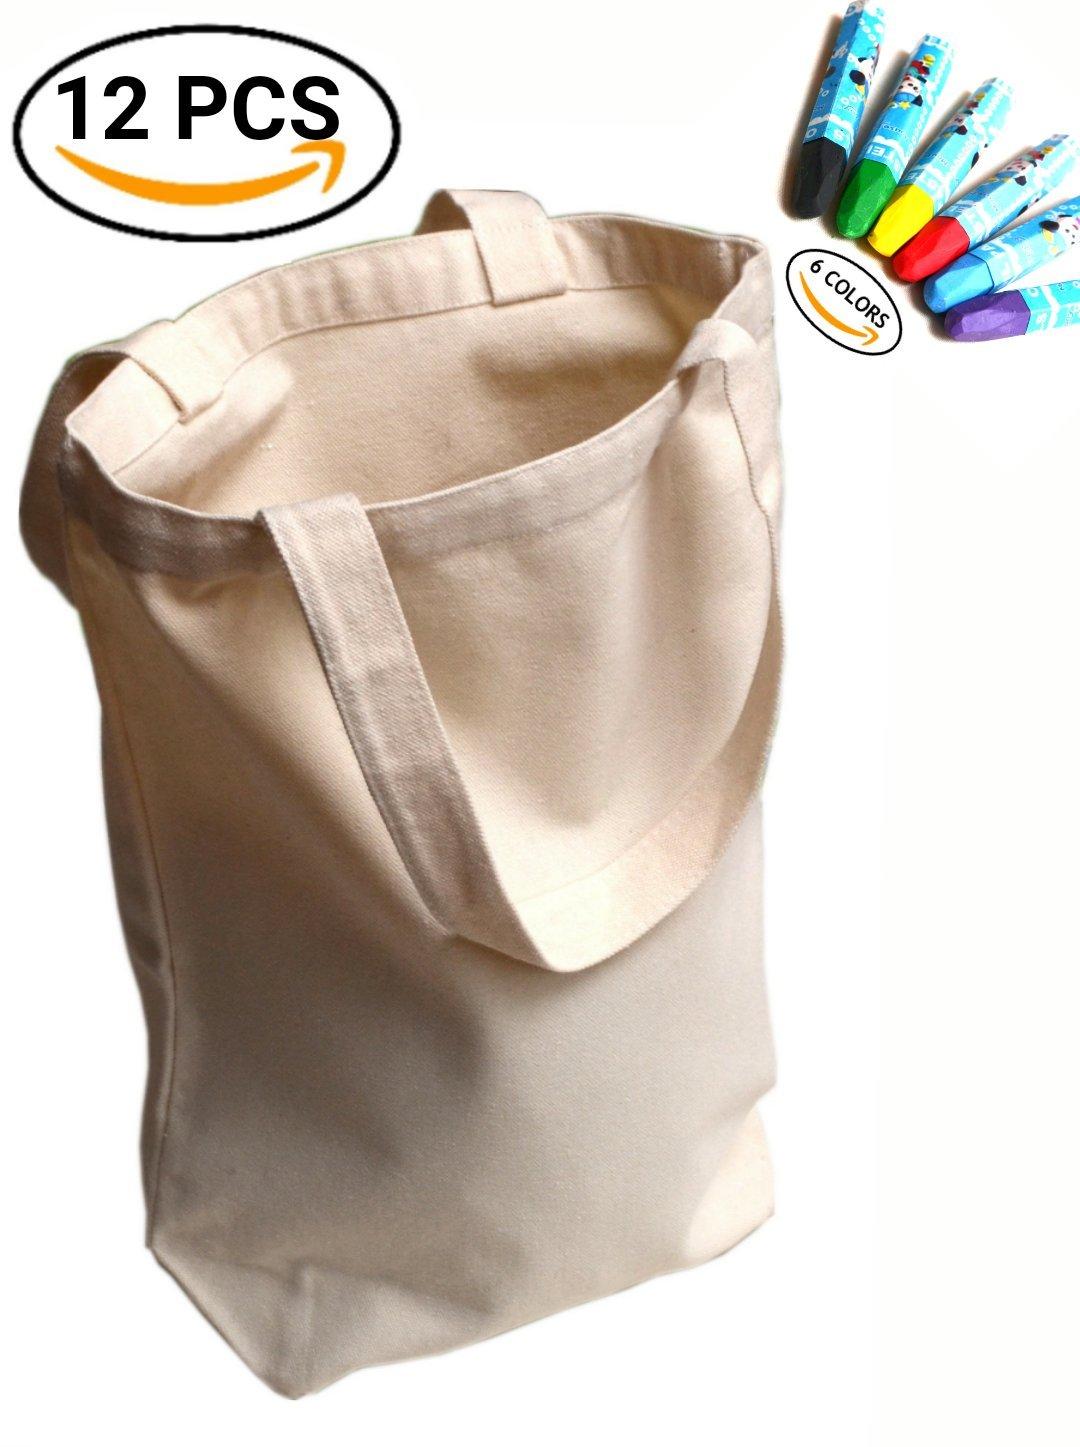 upbrandsキャンバストートバッグ – 6パック – ピュアカラー – Large – Suitable forギフト/ Favor andショッピング/ Grocery (頑丈な10オンス) – 含ま6パックa5インクジェット転送紙と6色ワックスクレヨン B07564K6FQ